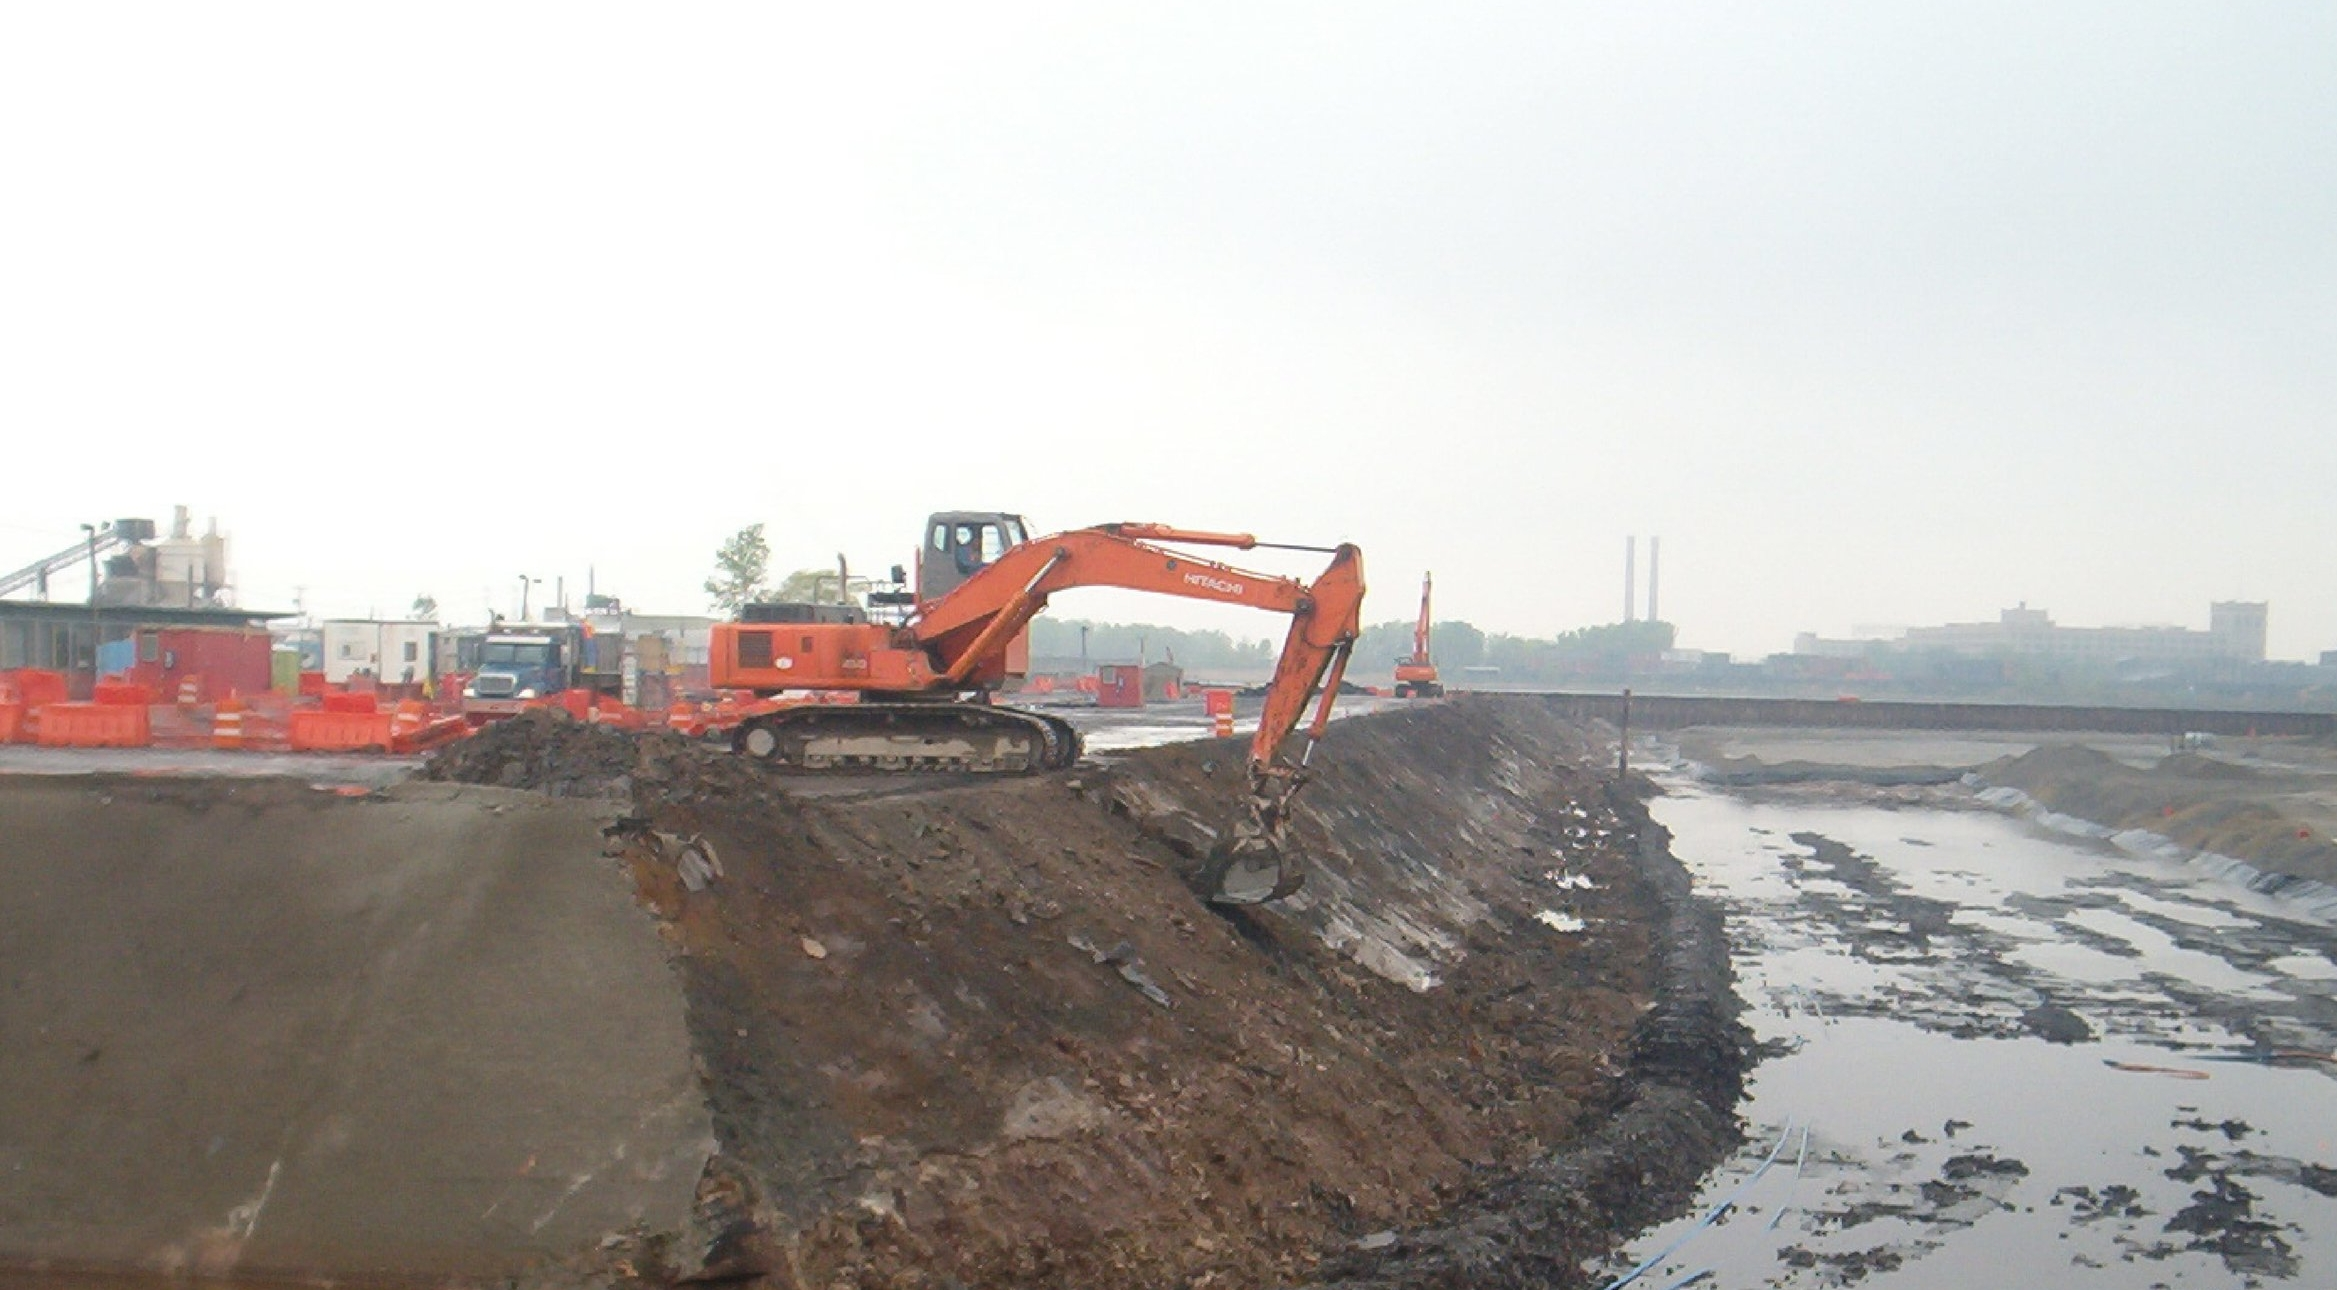 Excavation of Honeywell site (Jersey City, NJ),  ICO v. Honeywell